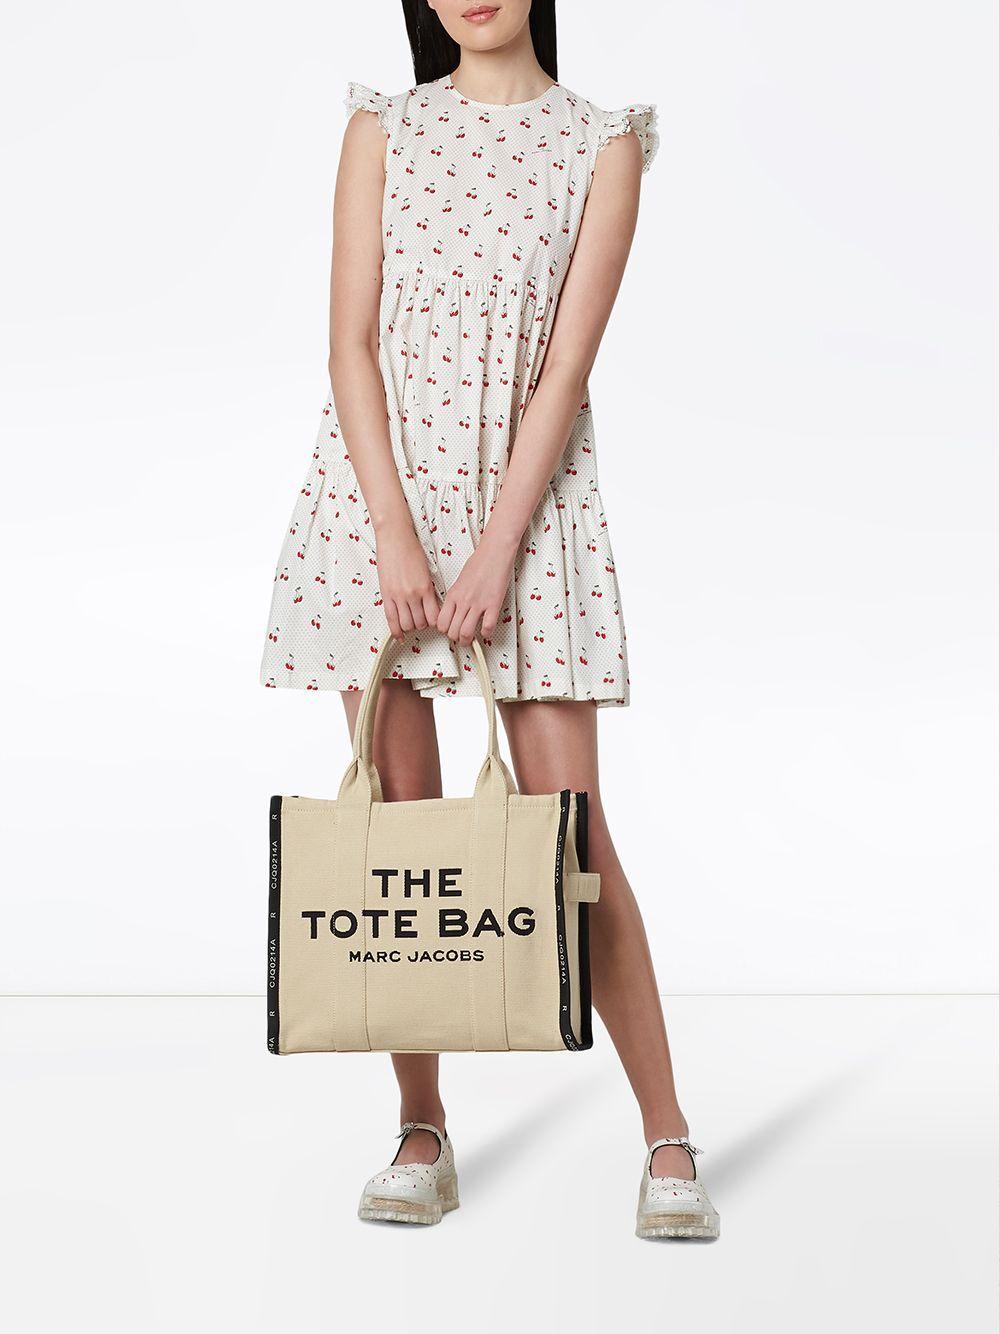 The Jacquard Traveler Tote Bag